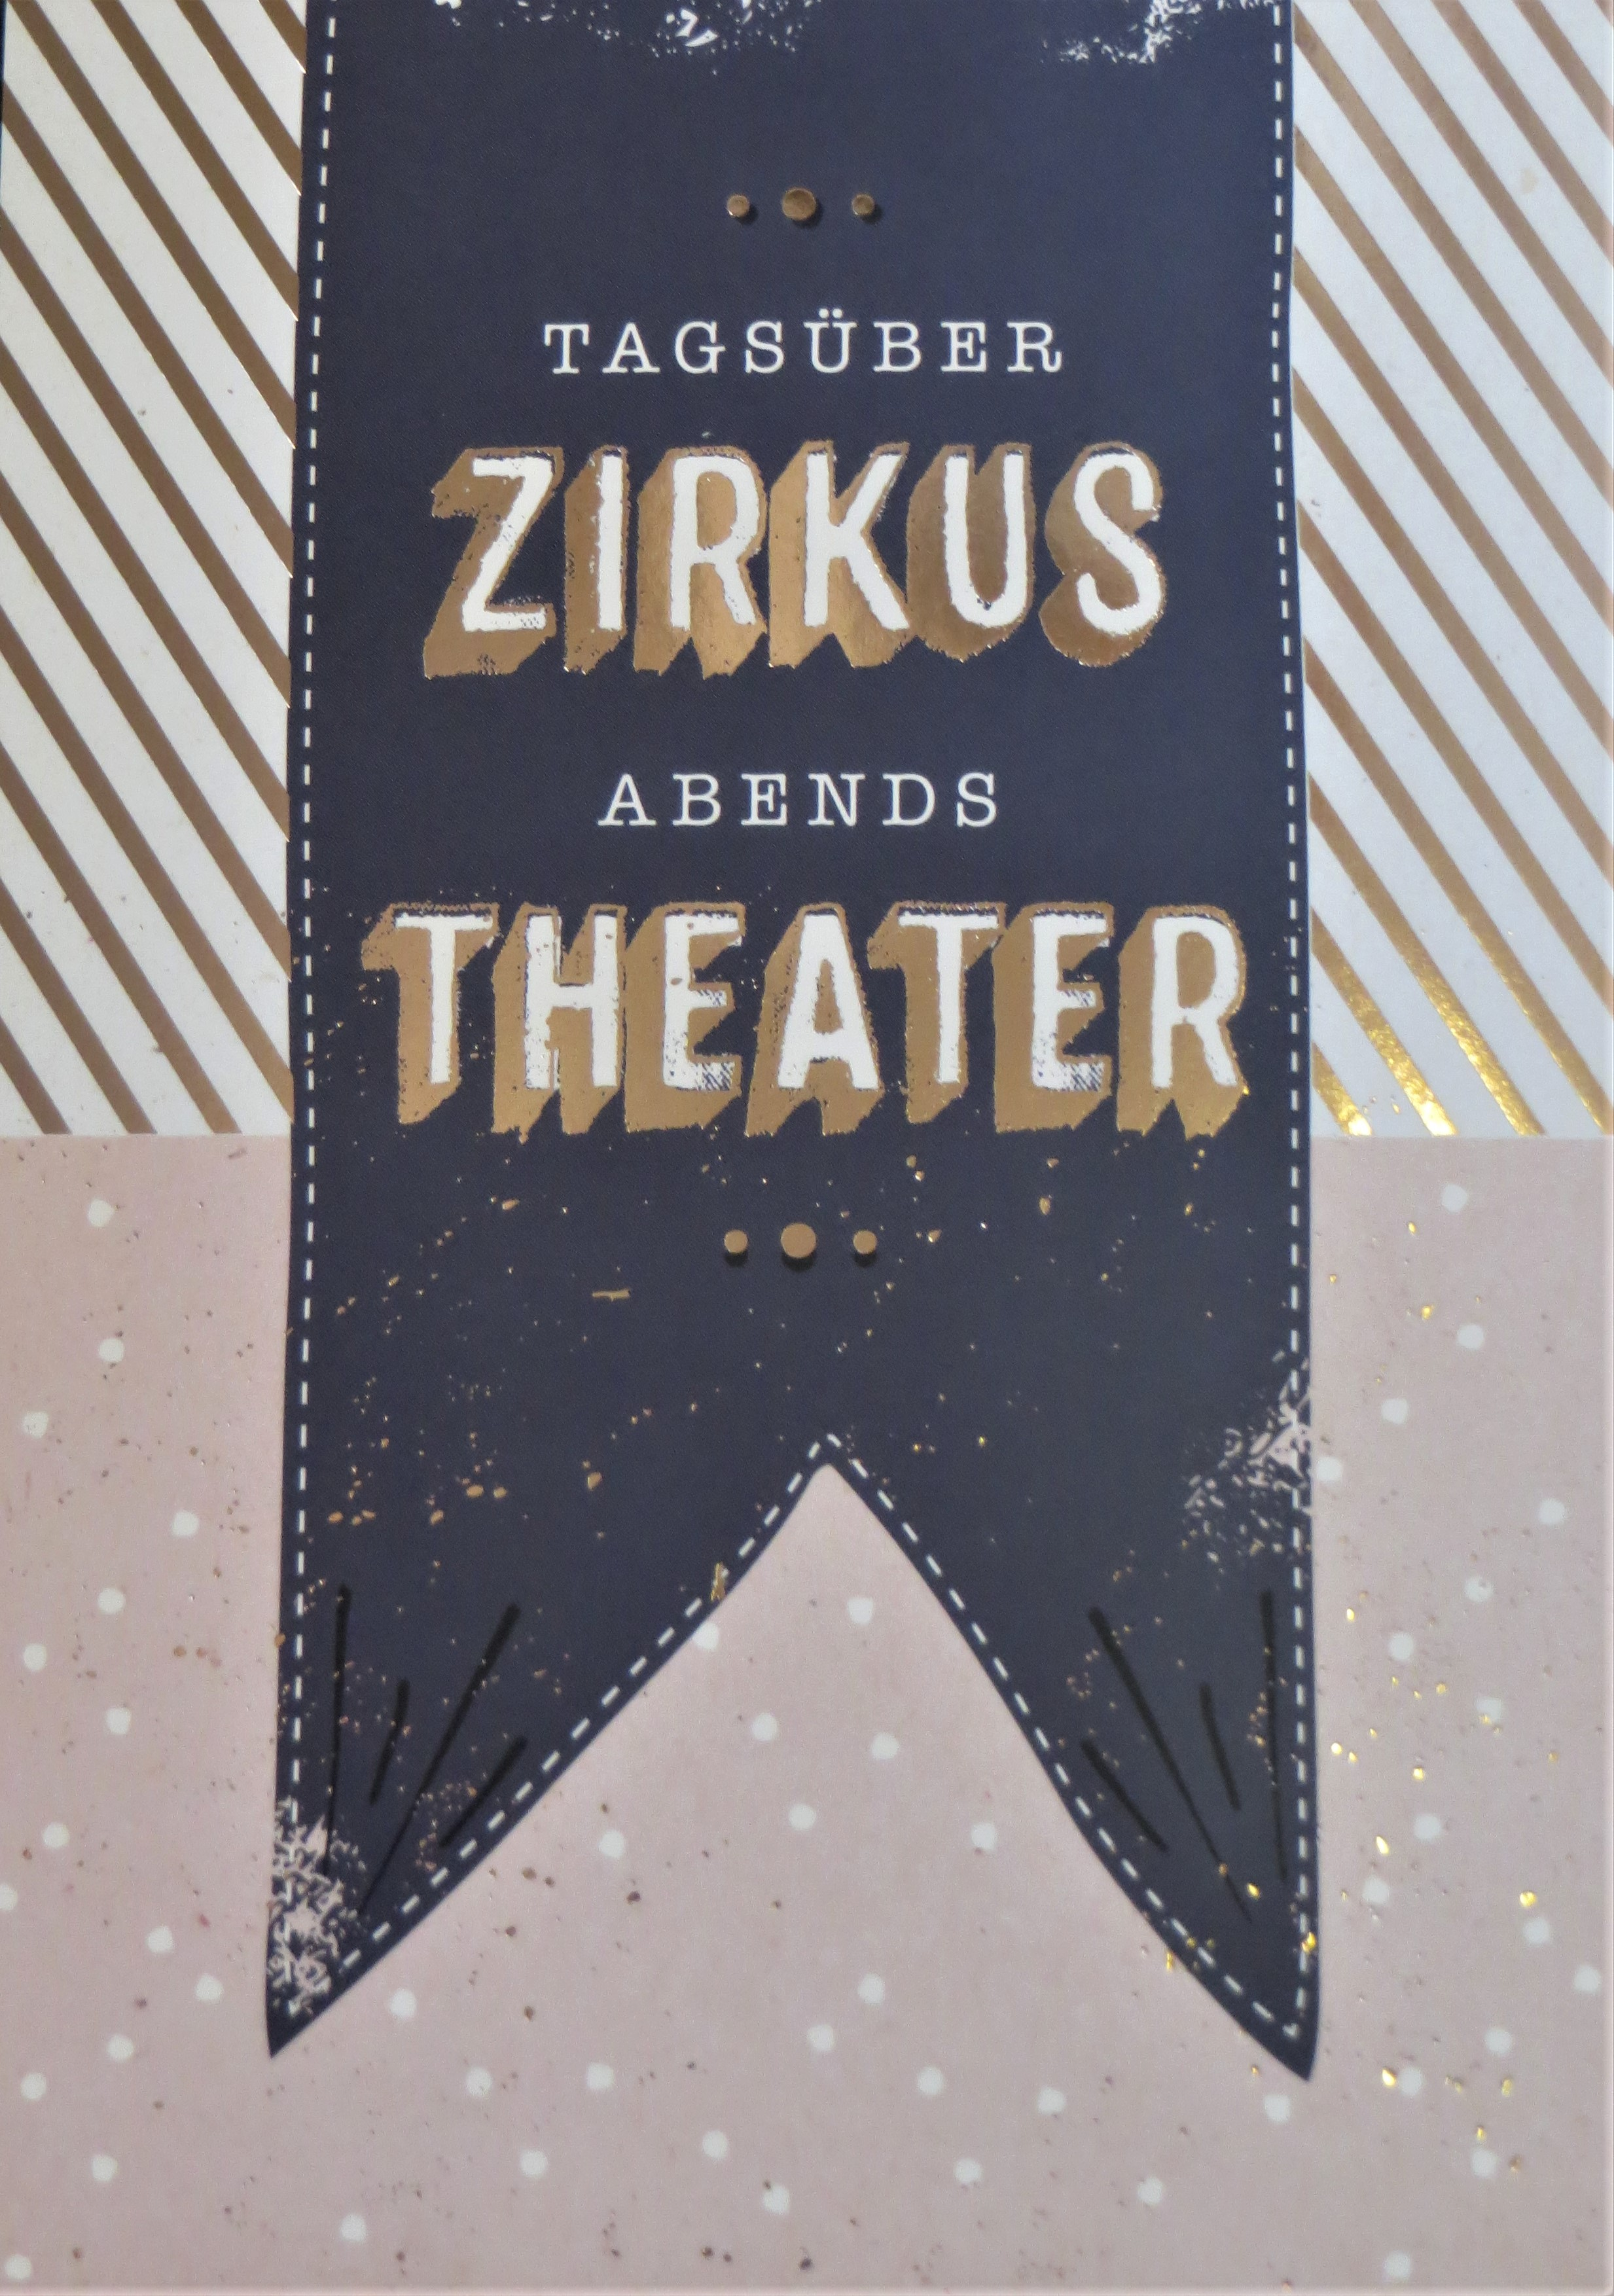 Postkarte Tagsüber Zirkus Abends Theater... VintageArt